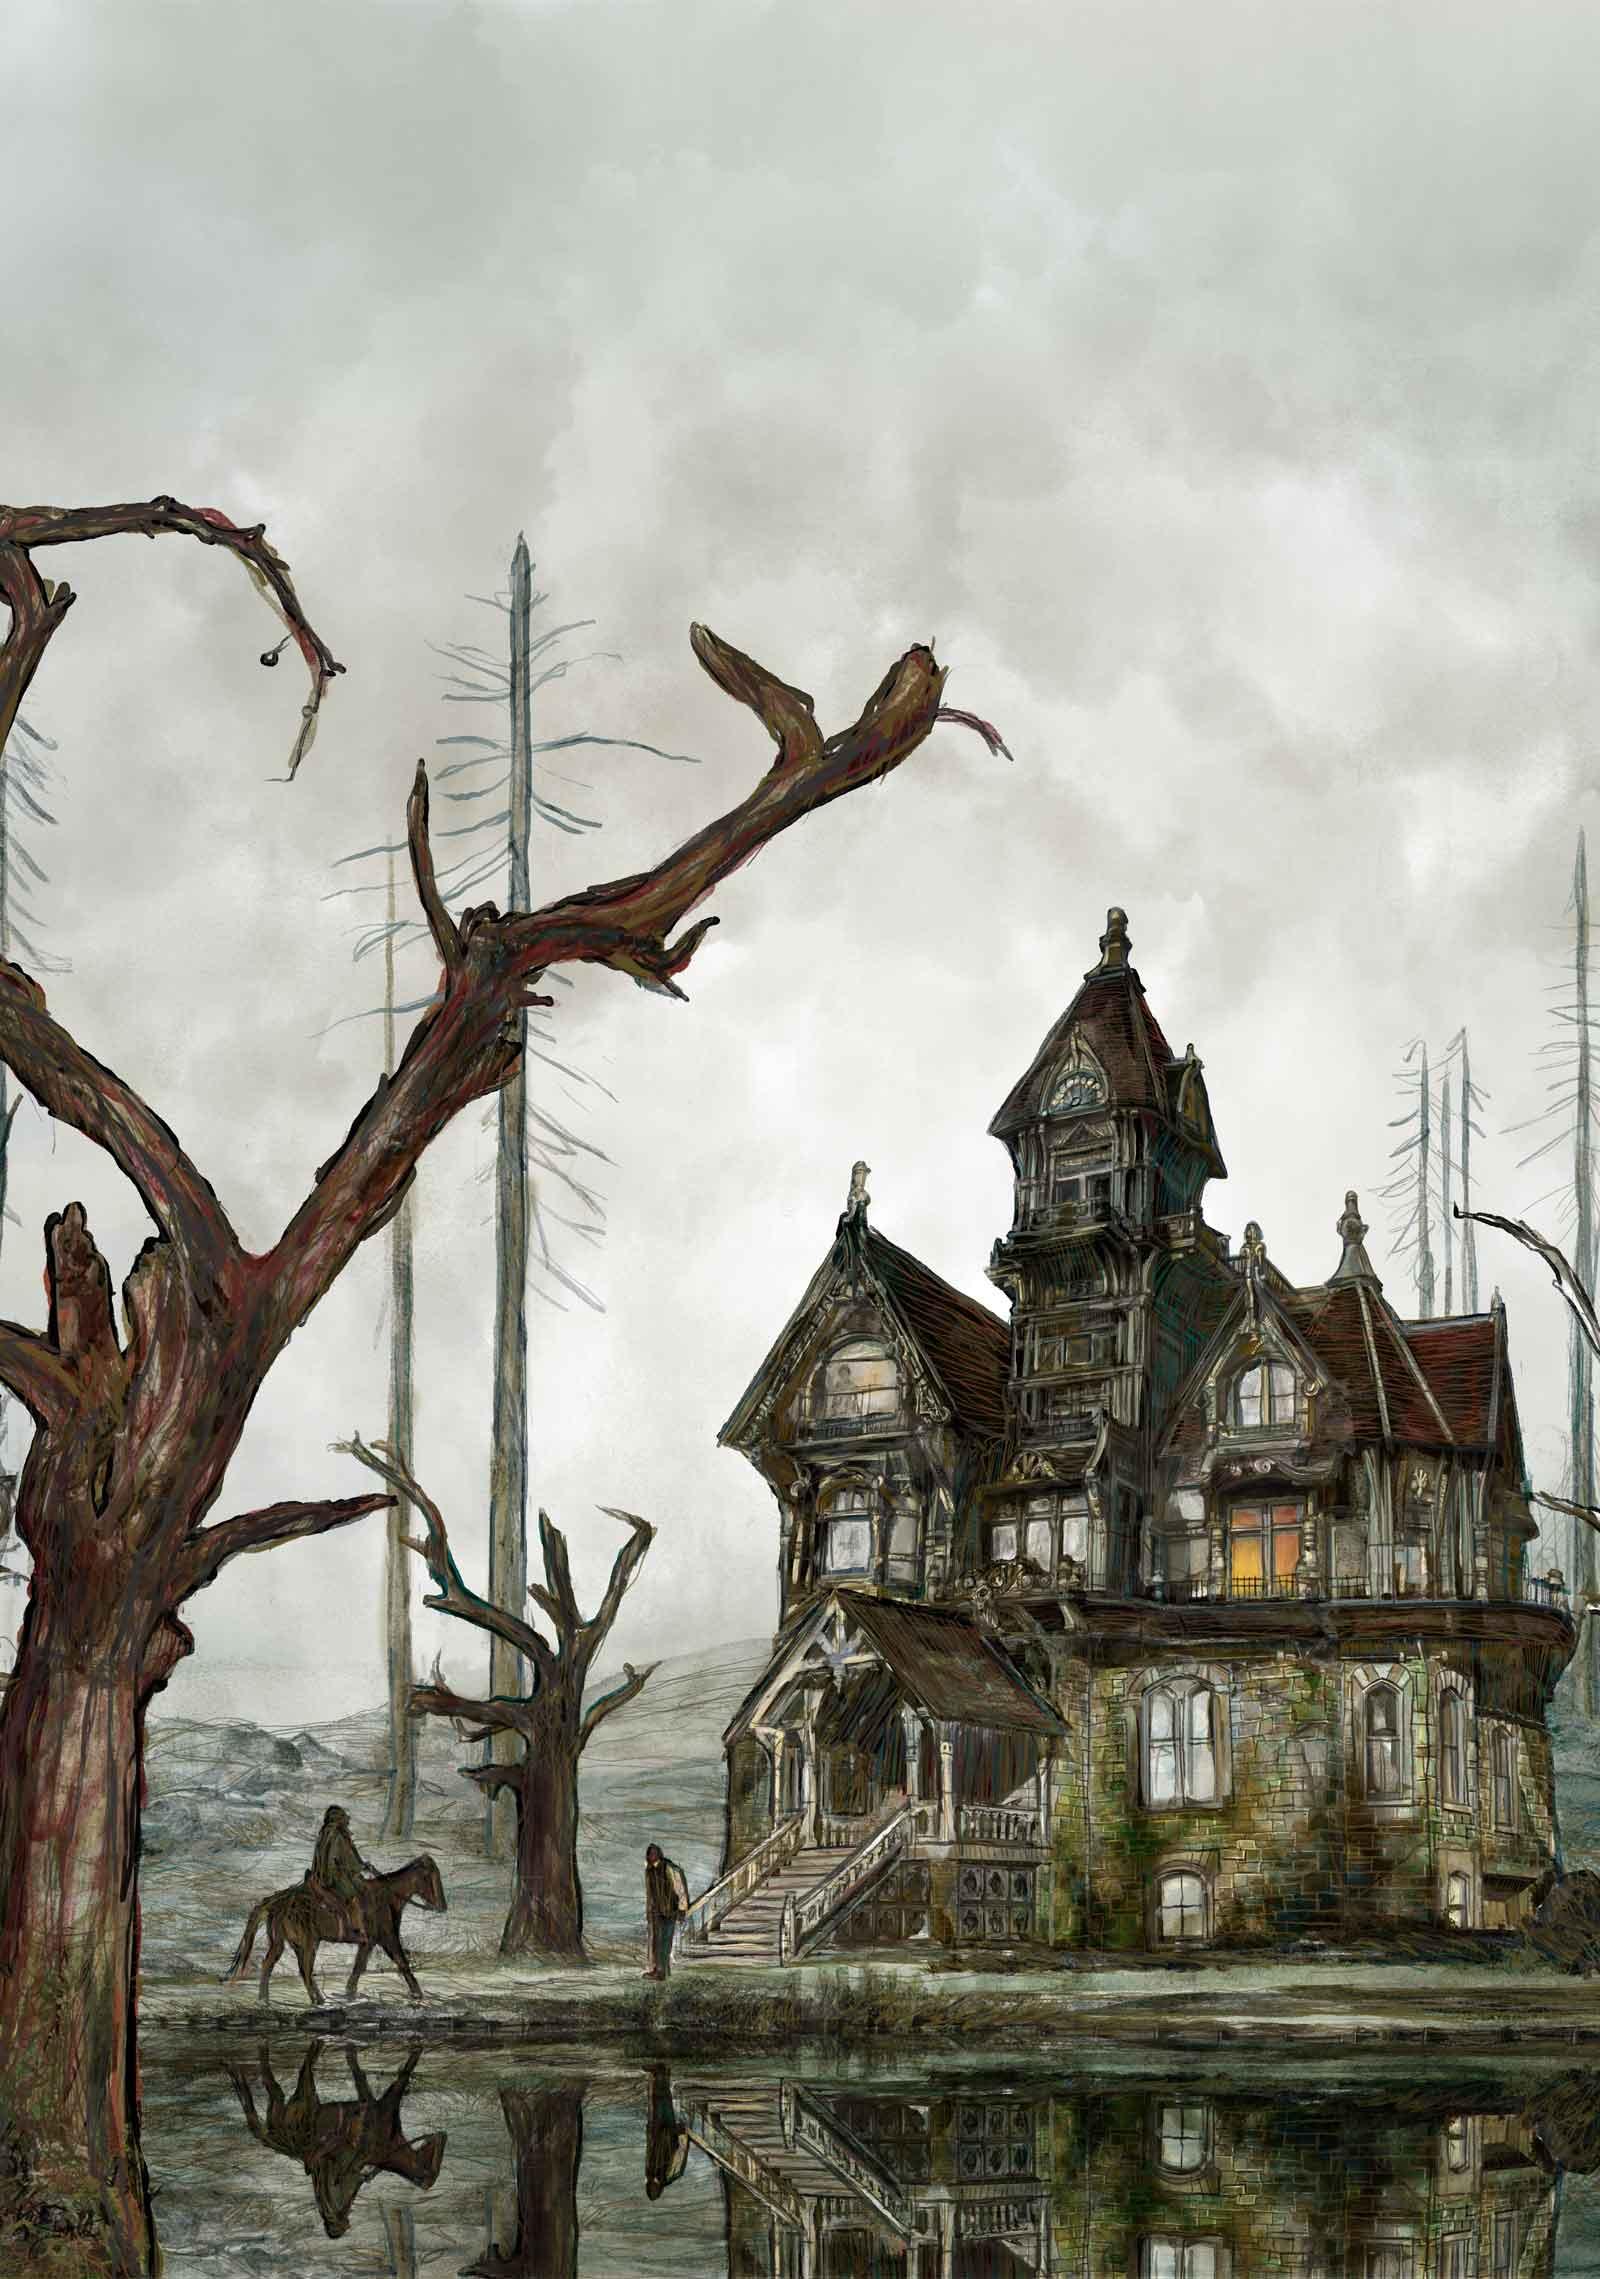 Mario Jodra illustration - Detail of illustration. The Fall of the House of Usher by Edgar Allan Poe.